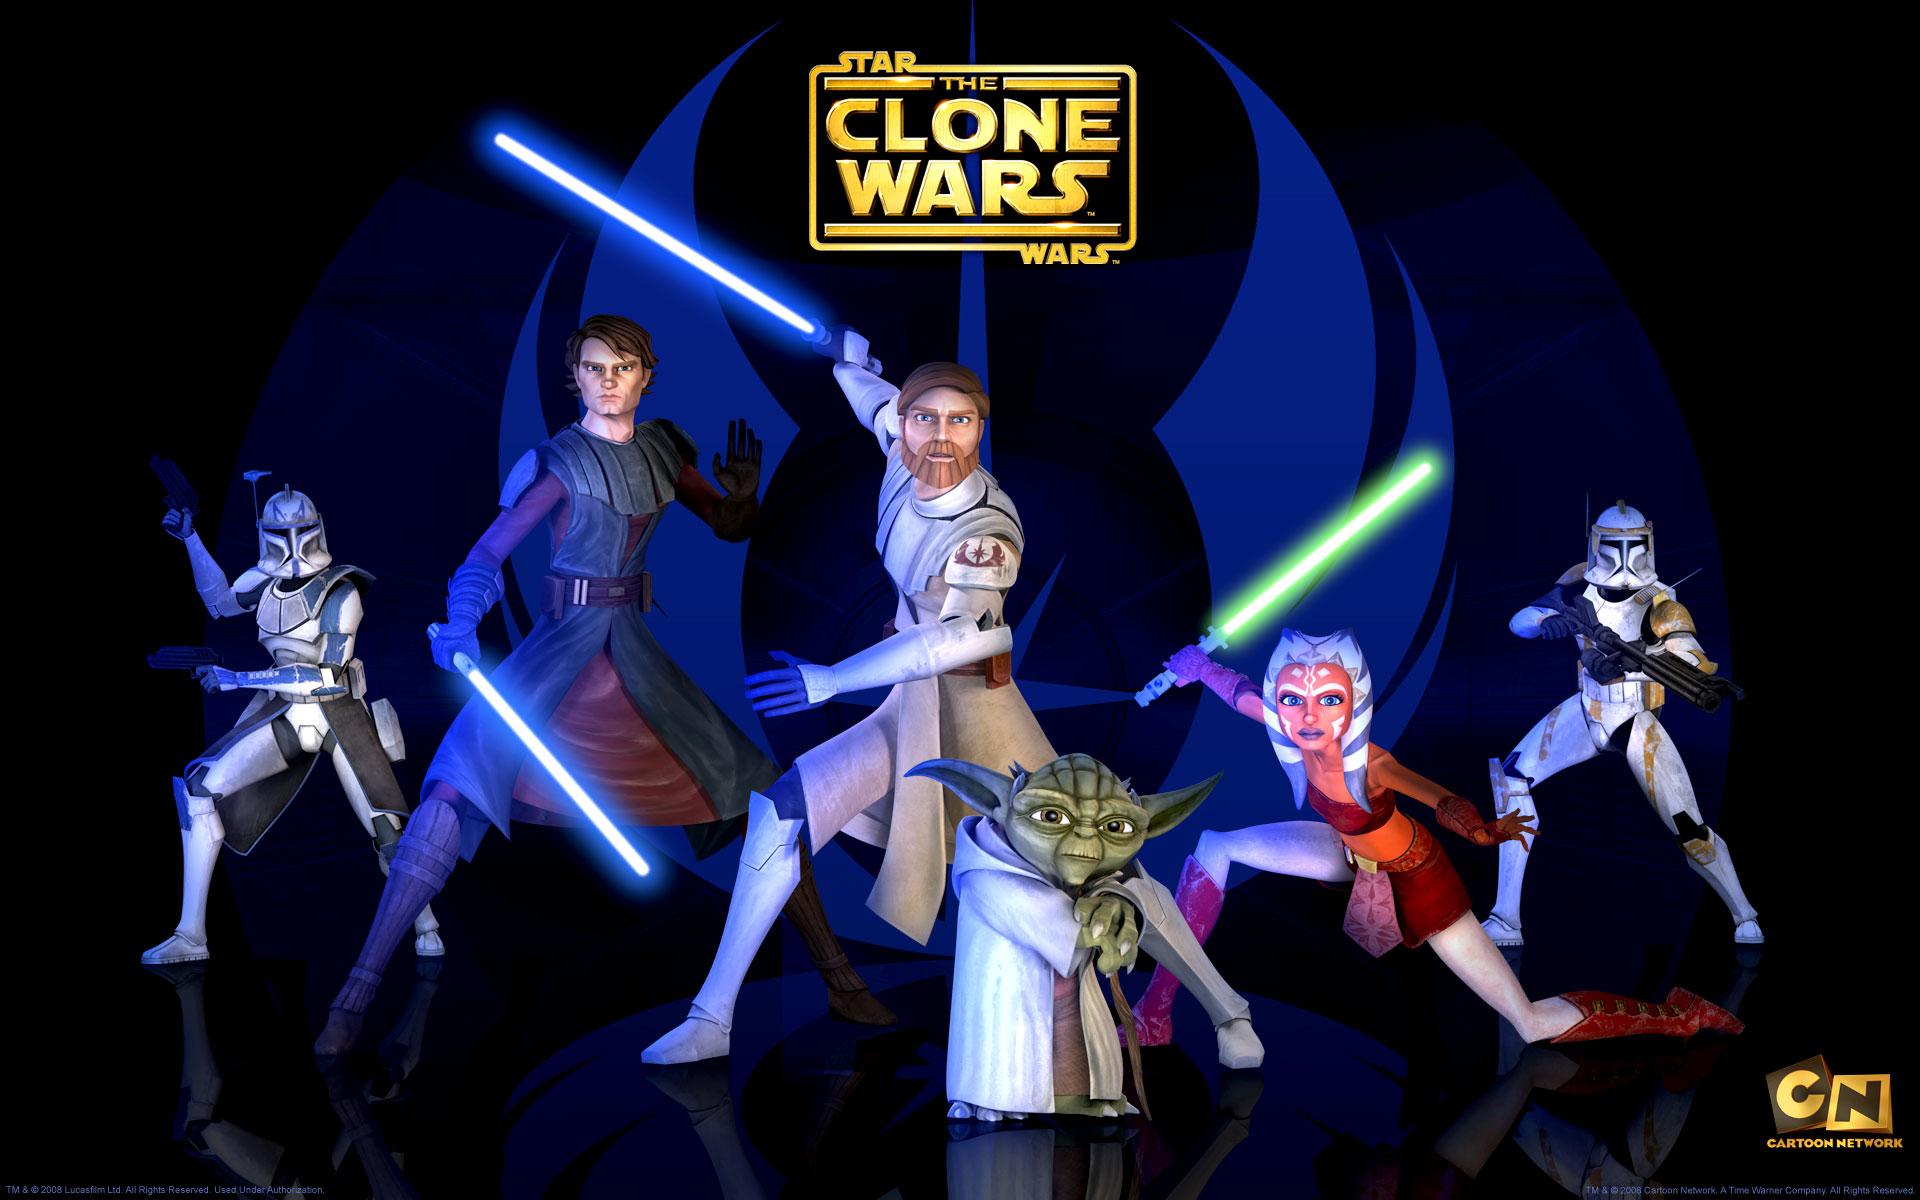 50 Animated Star Wars Wallpapers On Wallpapersafari